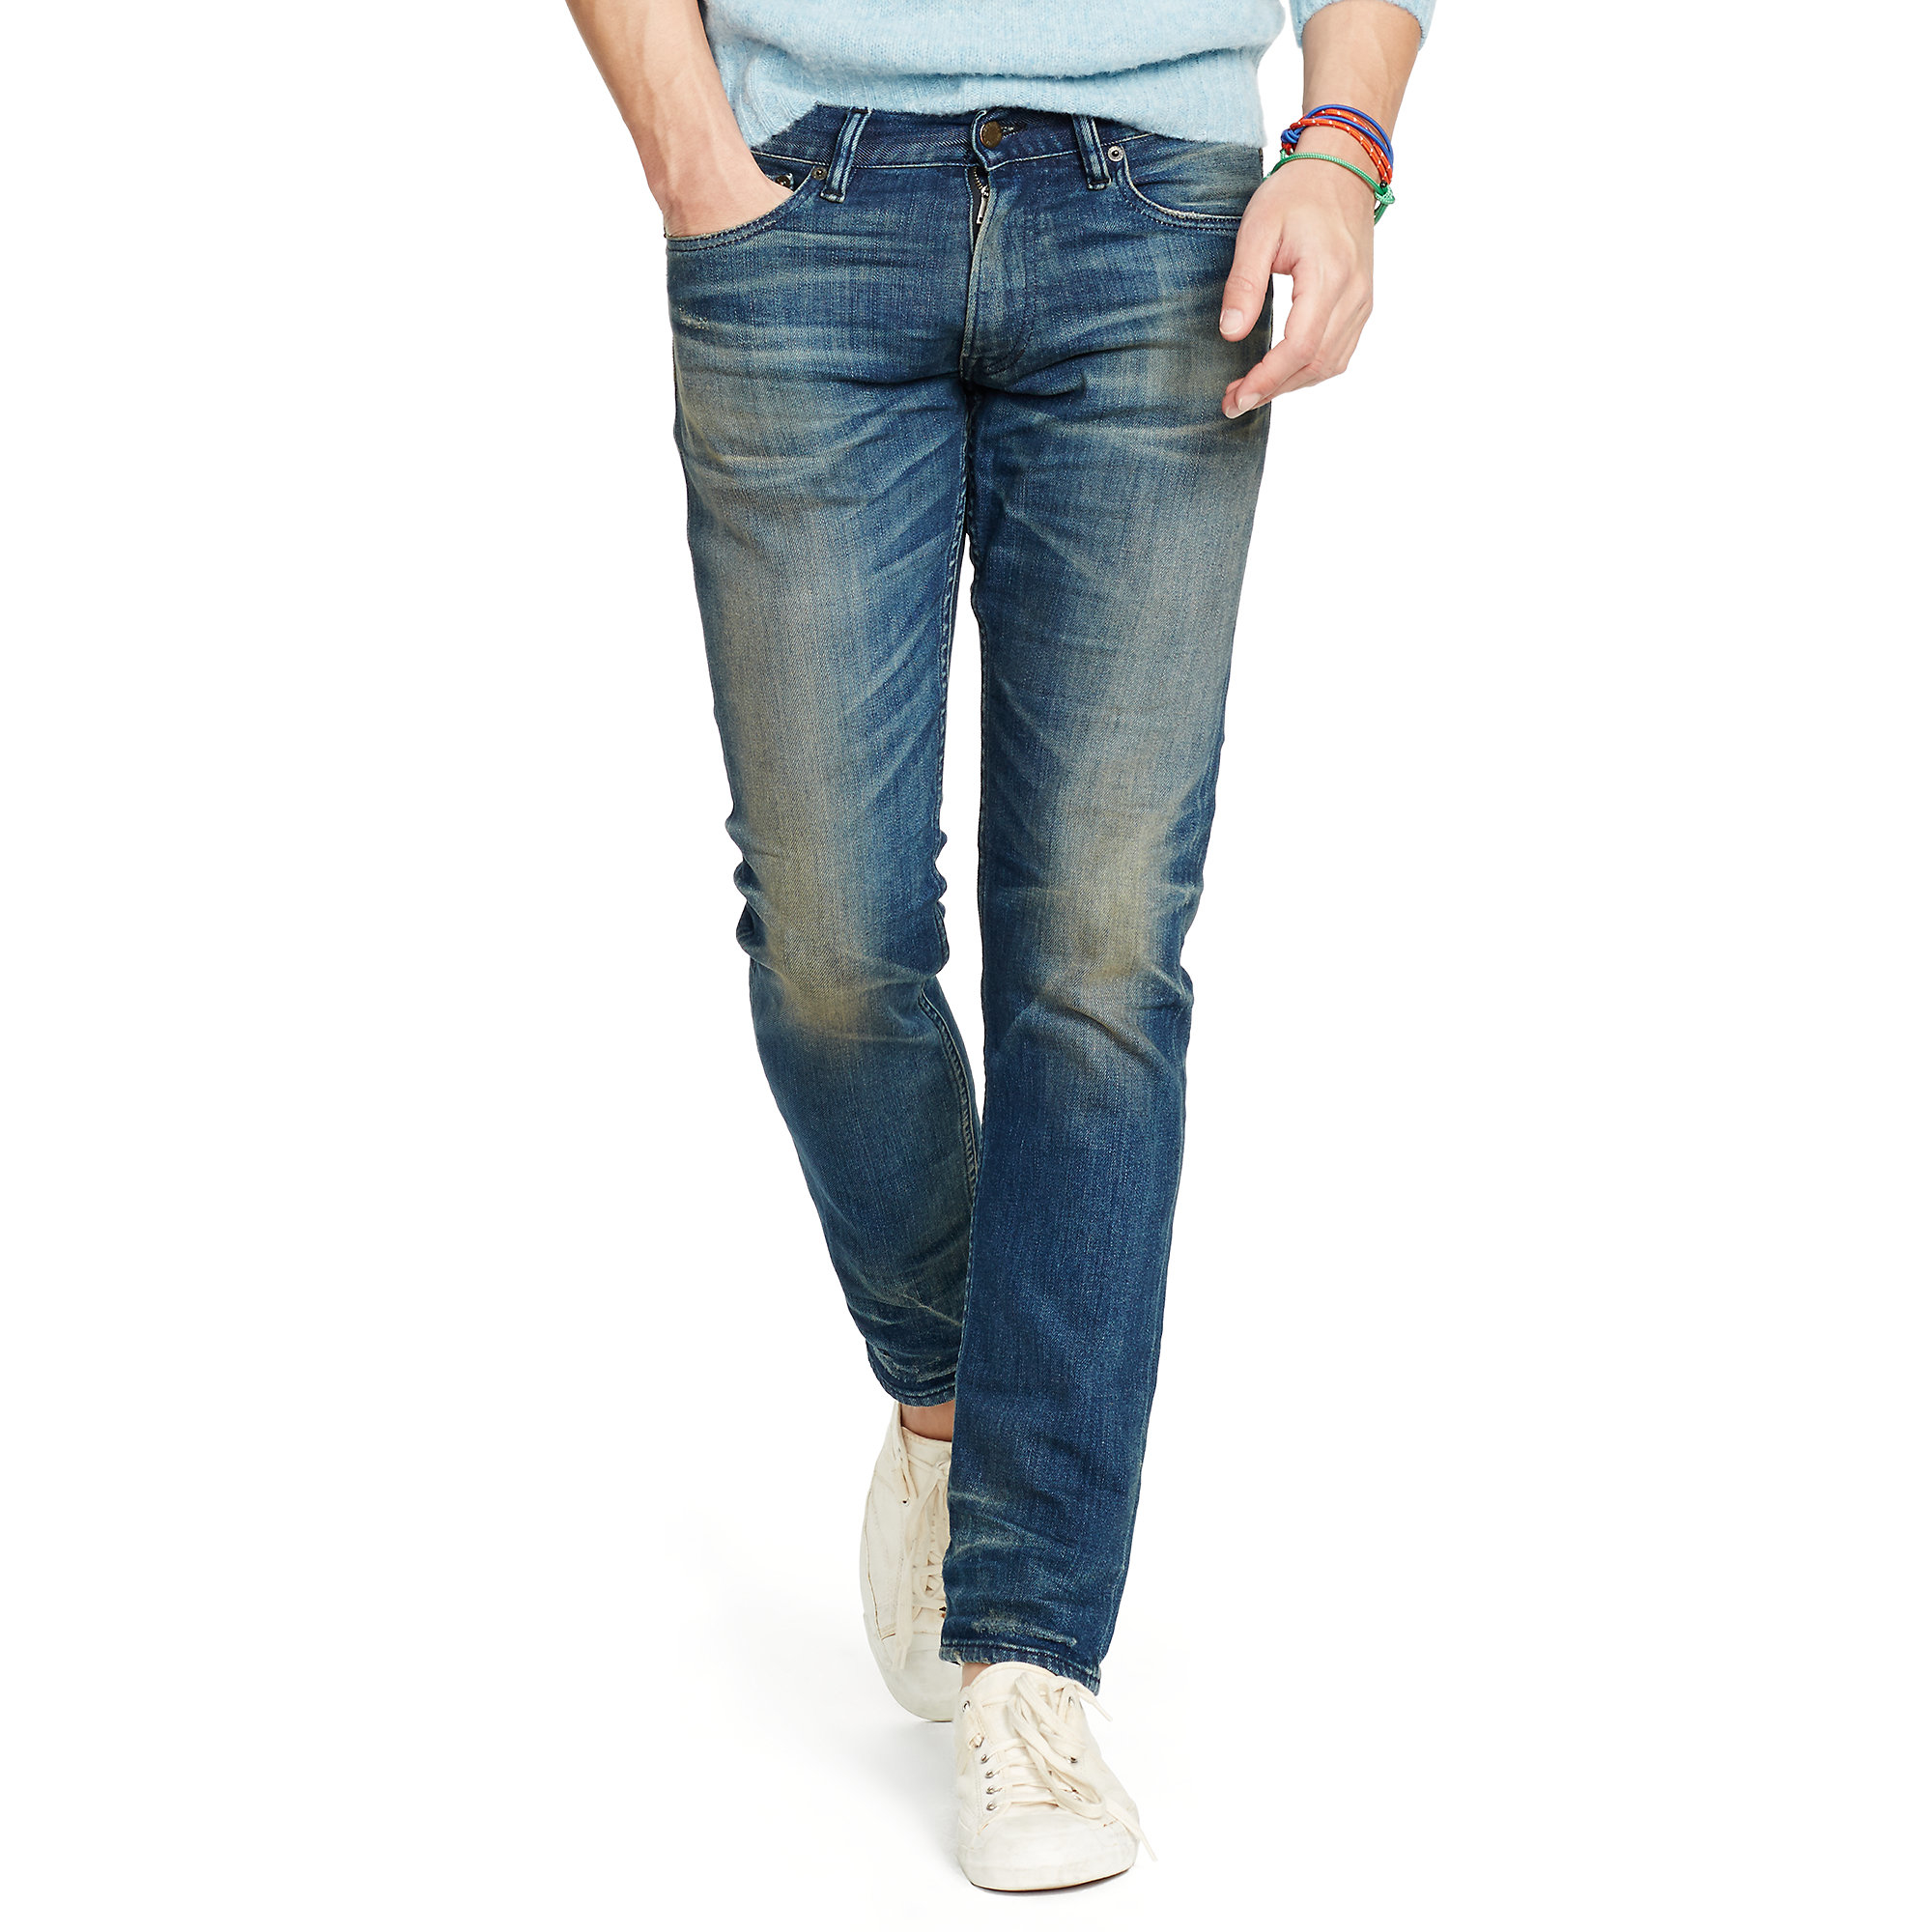 Lyst - Polo Ralph Lauren Sullivan Slim-fit Jean in Blue for Men 9951c4743774